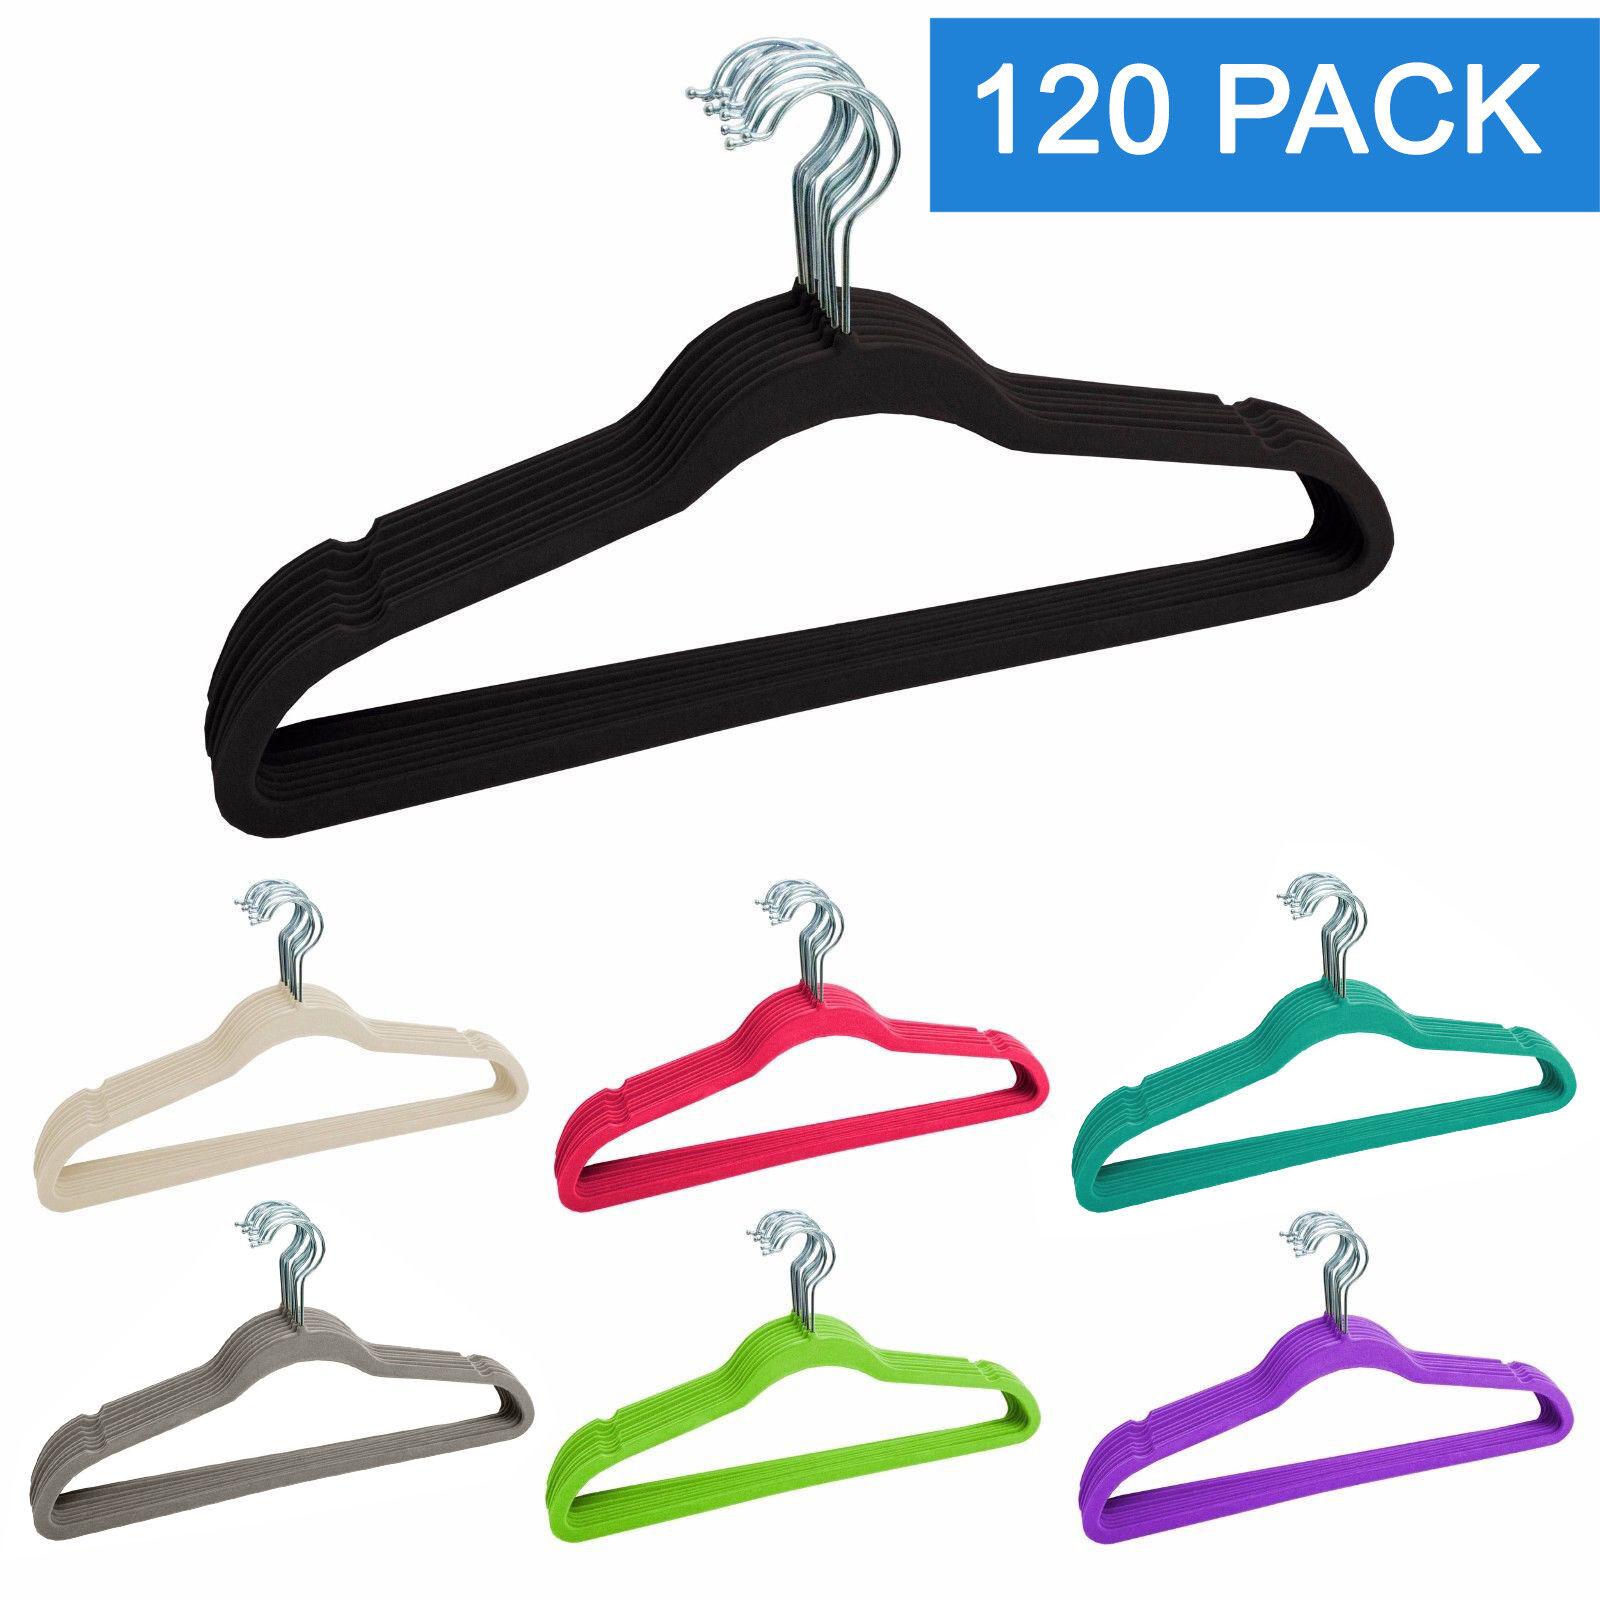 velvet clothes hangers follow - HD1600×1600